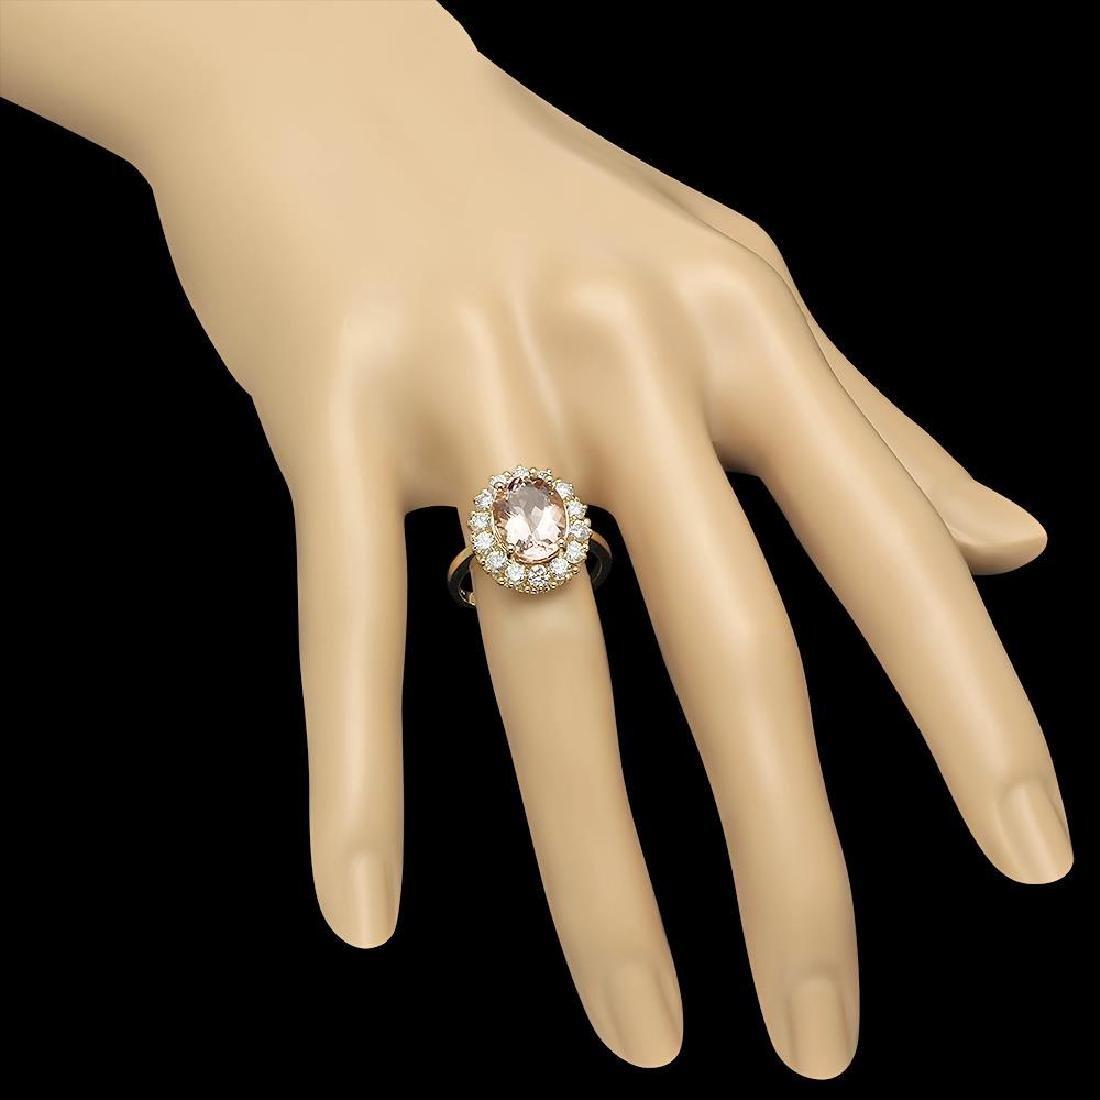 14K Gold 3.23ct Morganite 1.09ct Diamond Ring - 3